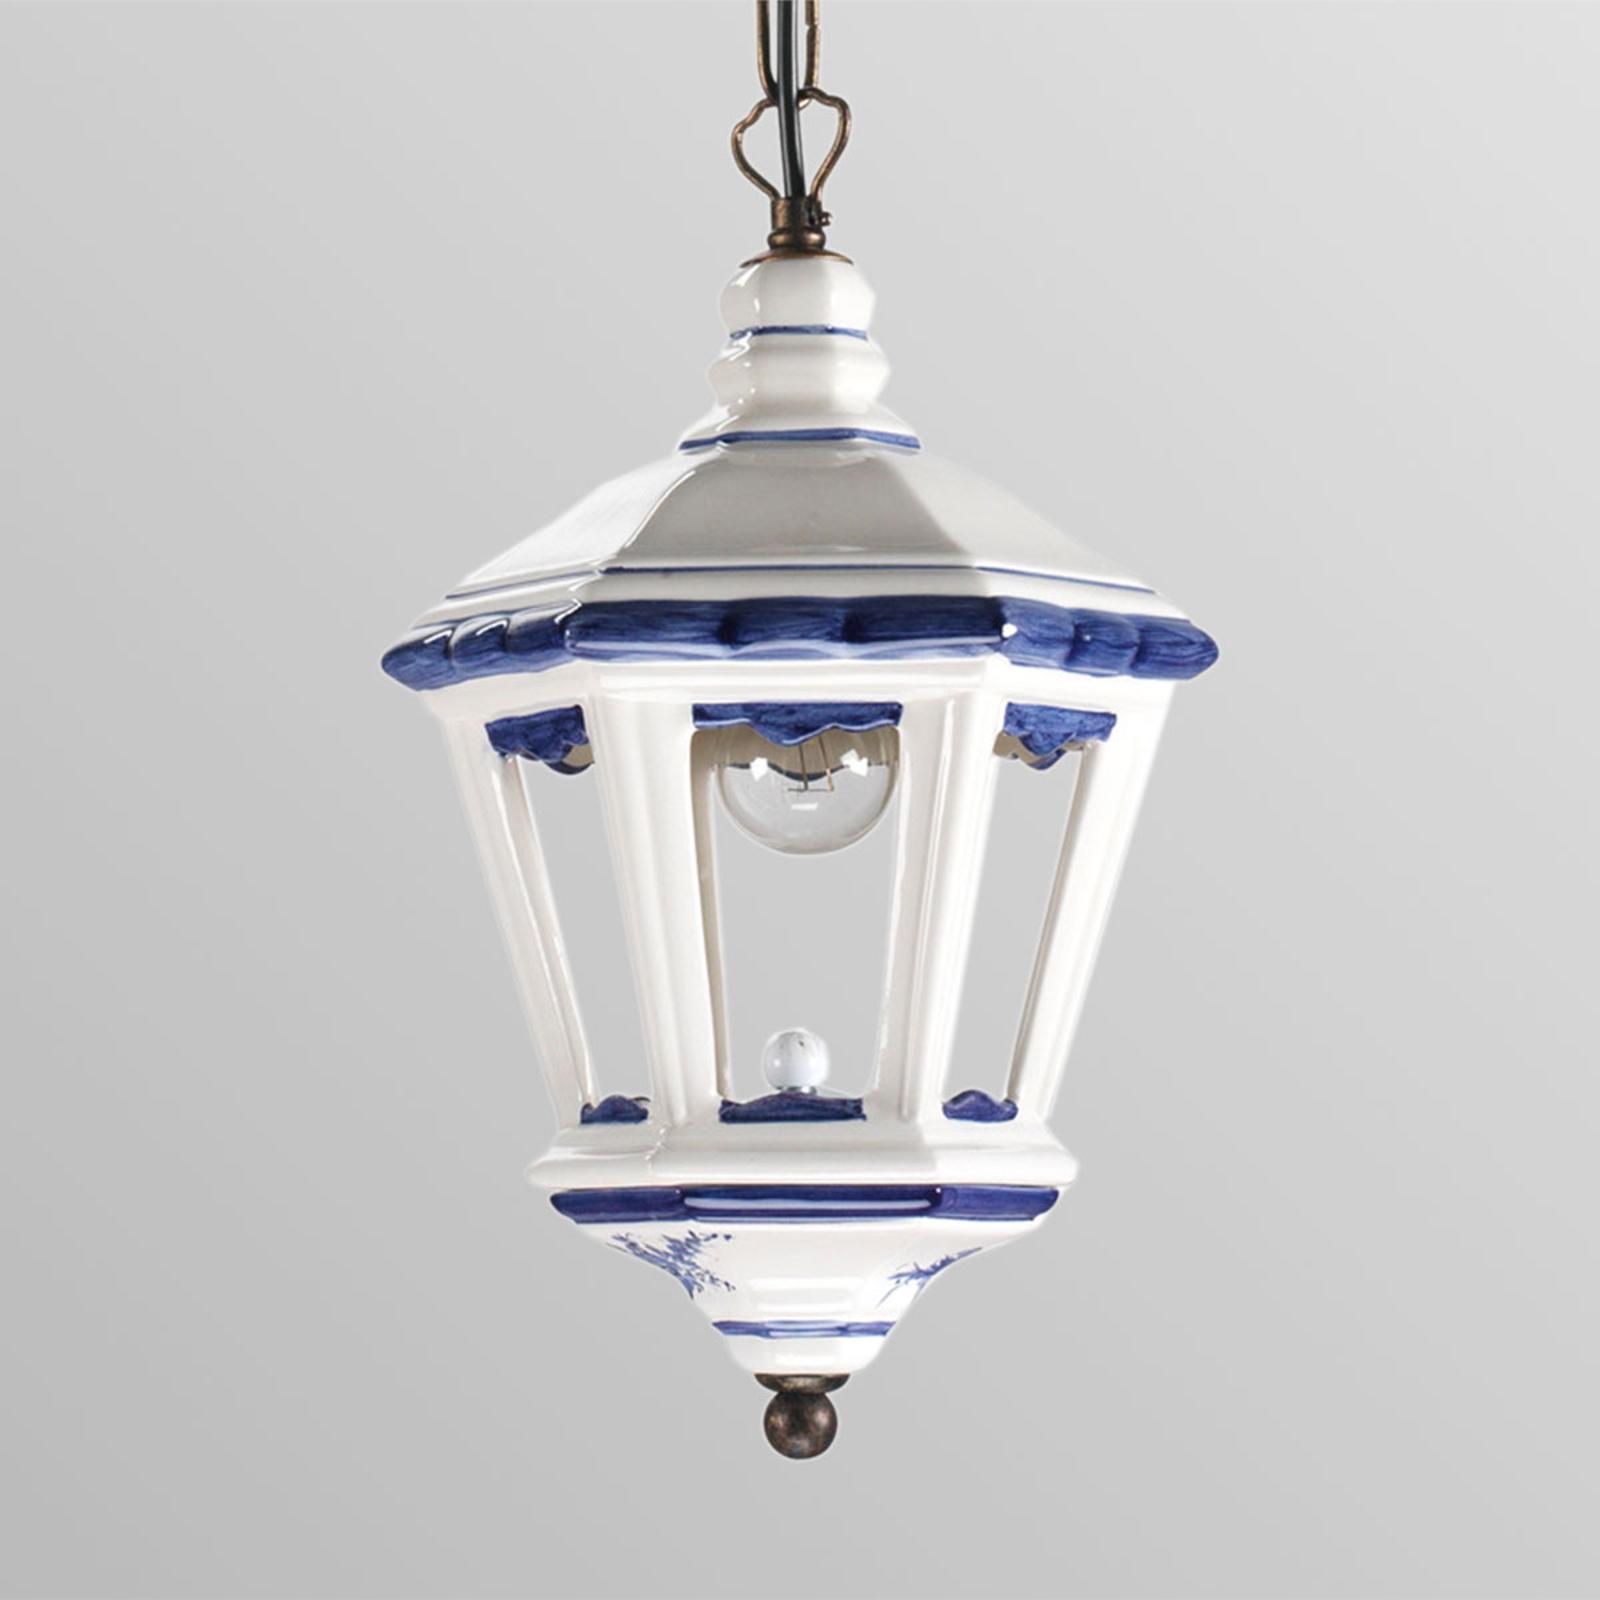 Adonia - hanglamp in lantaarnvorm